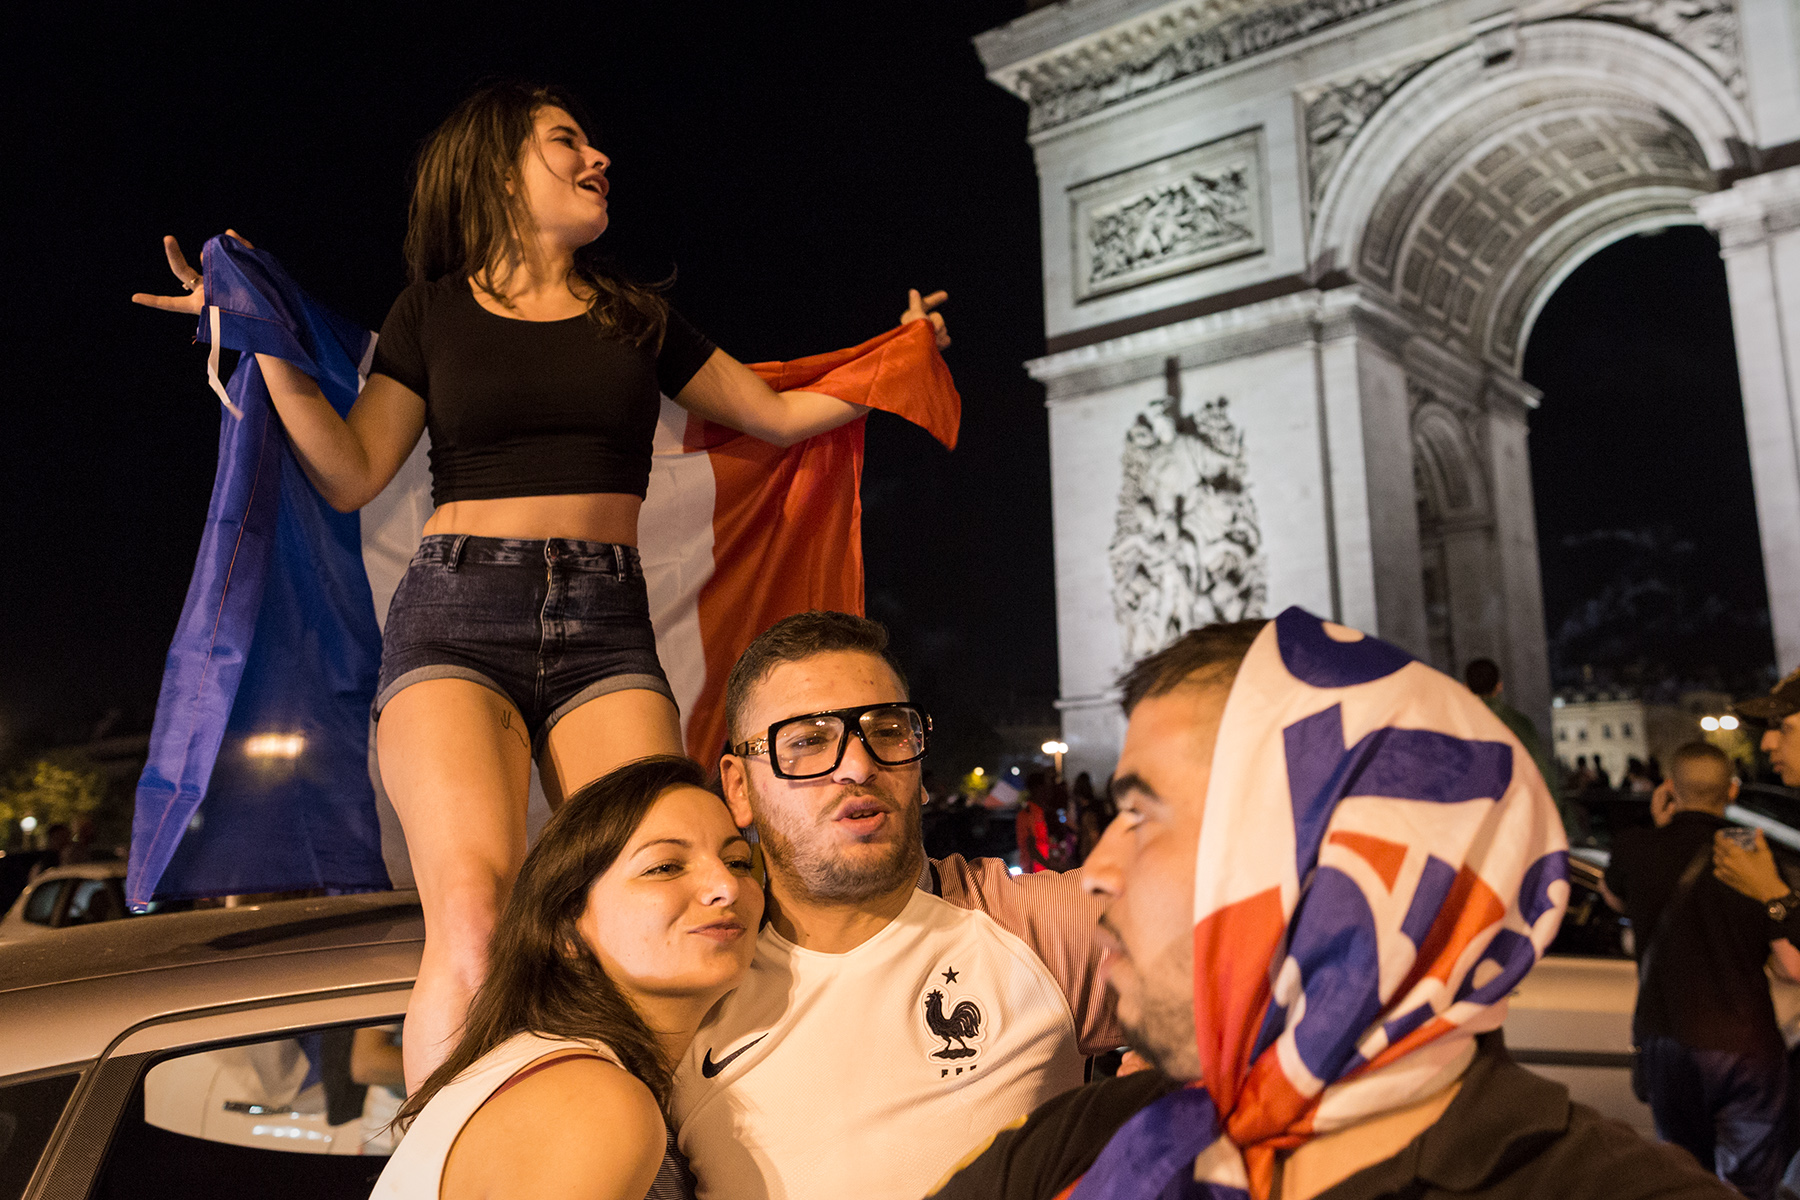 Euro2016_ArnaudAndrieu16